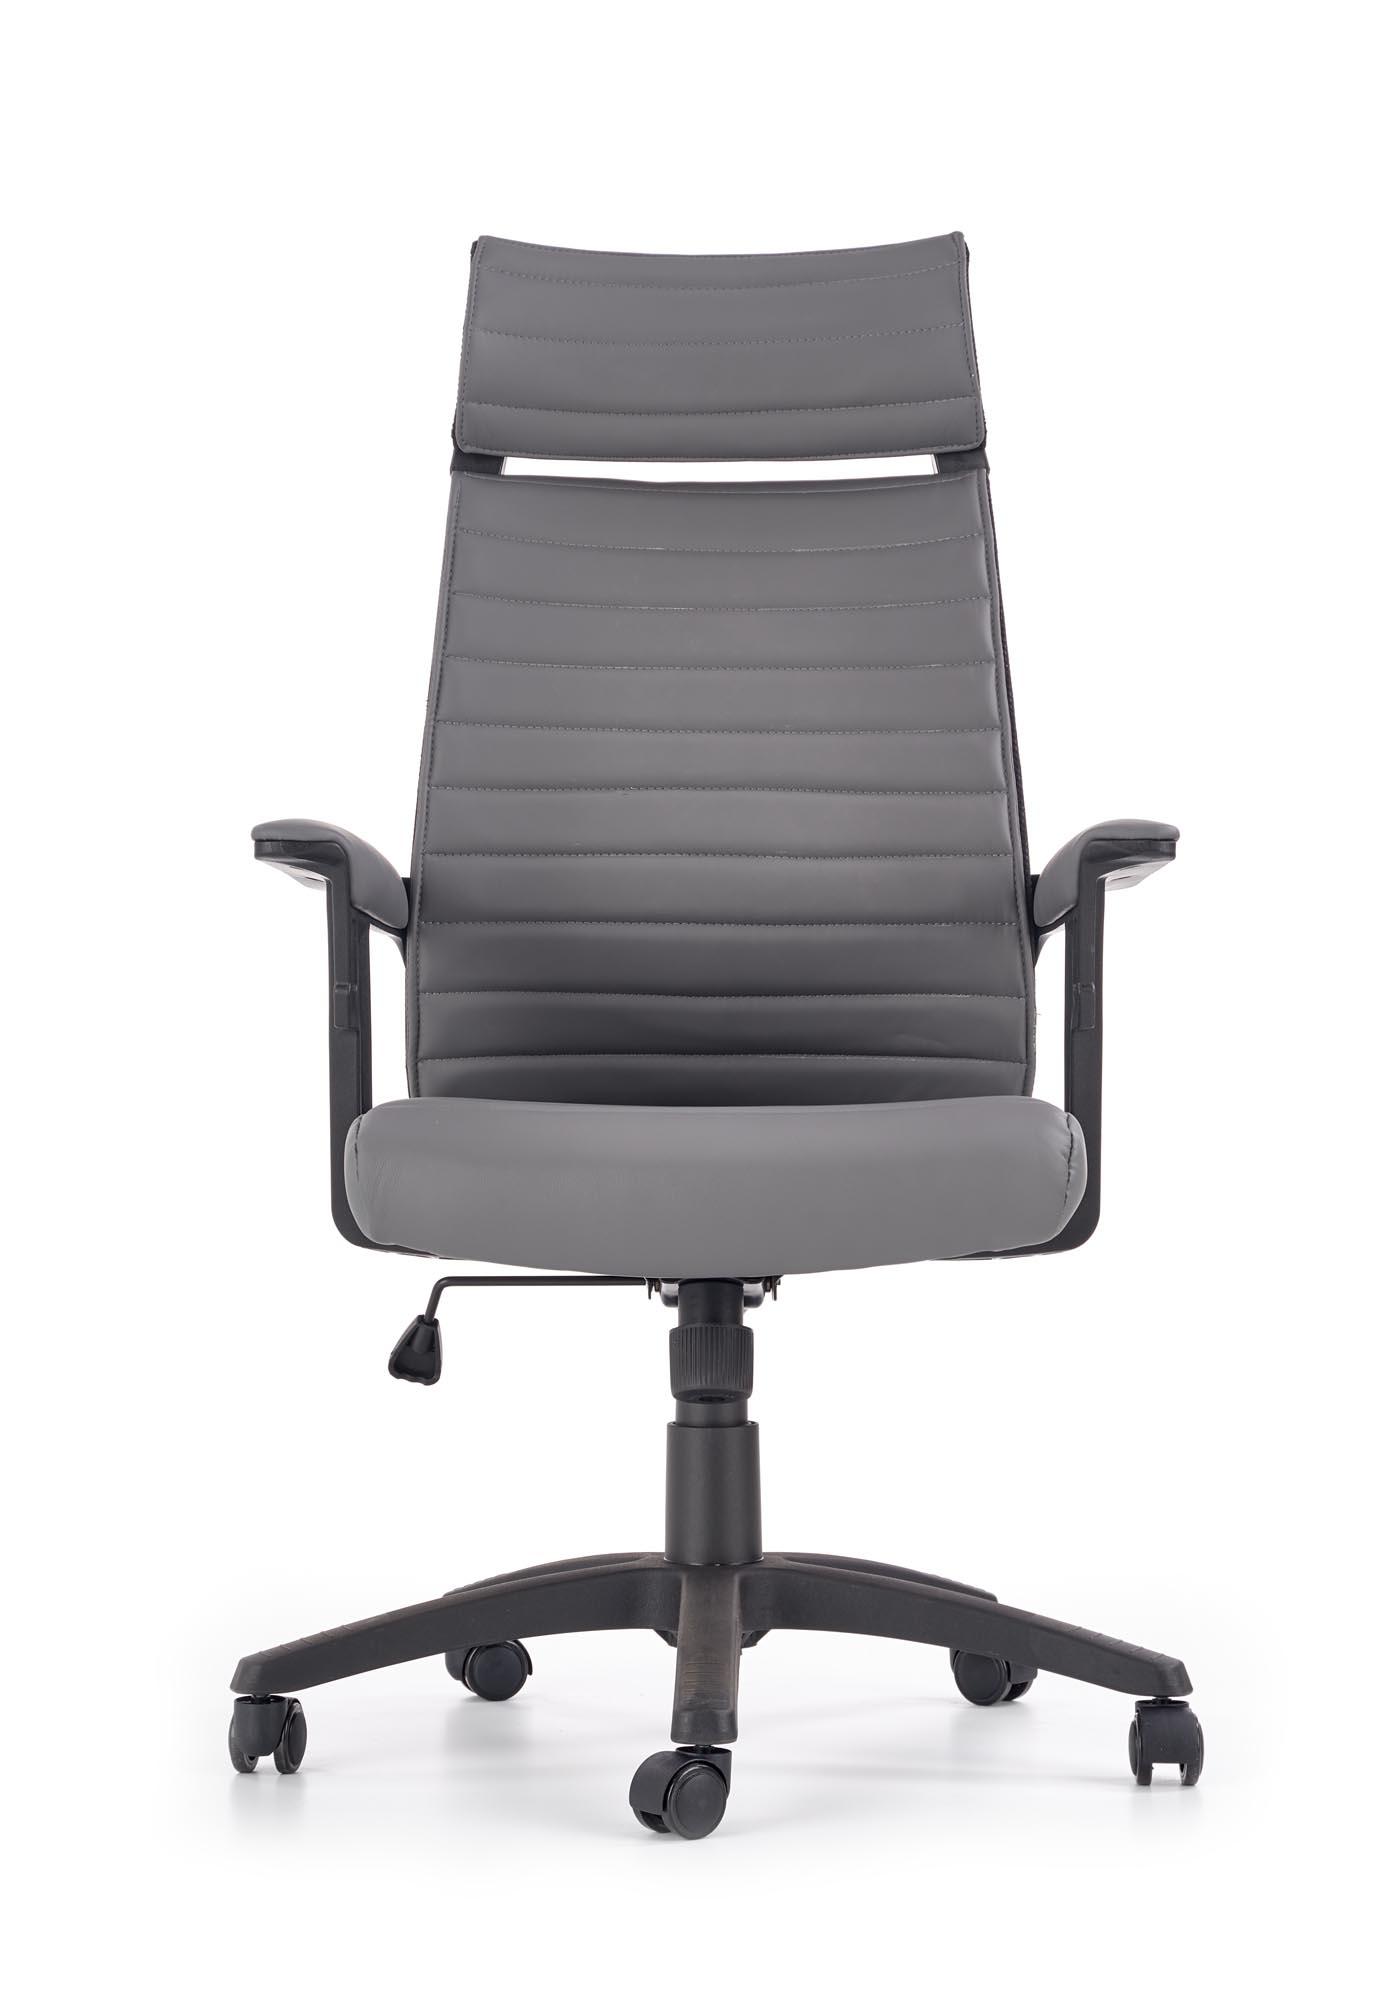 Scaun de birou ergonomic, tapitat cu piele ecologica Leland Gri, l64xA73xH122-132 cm vivre.ro